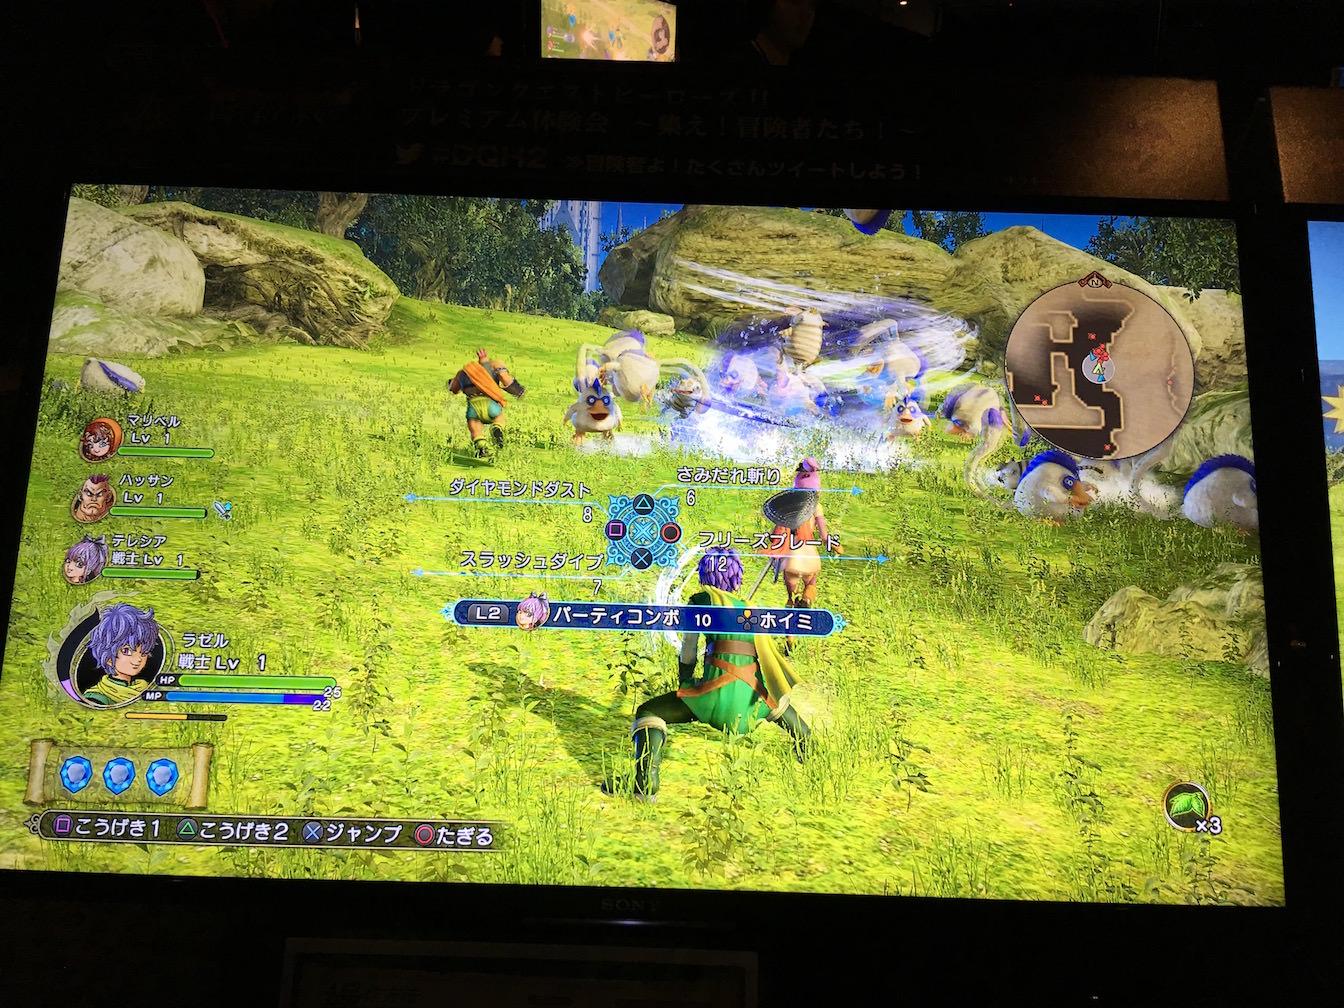 Dragon quest heros 2 premium experience meeting report 22